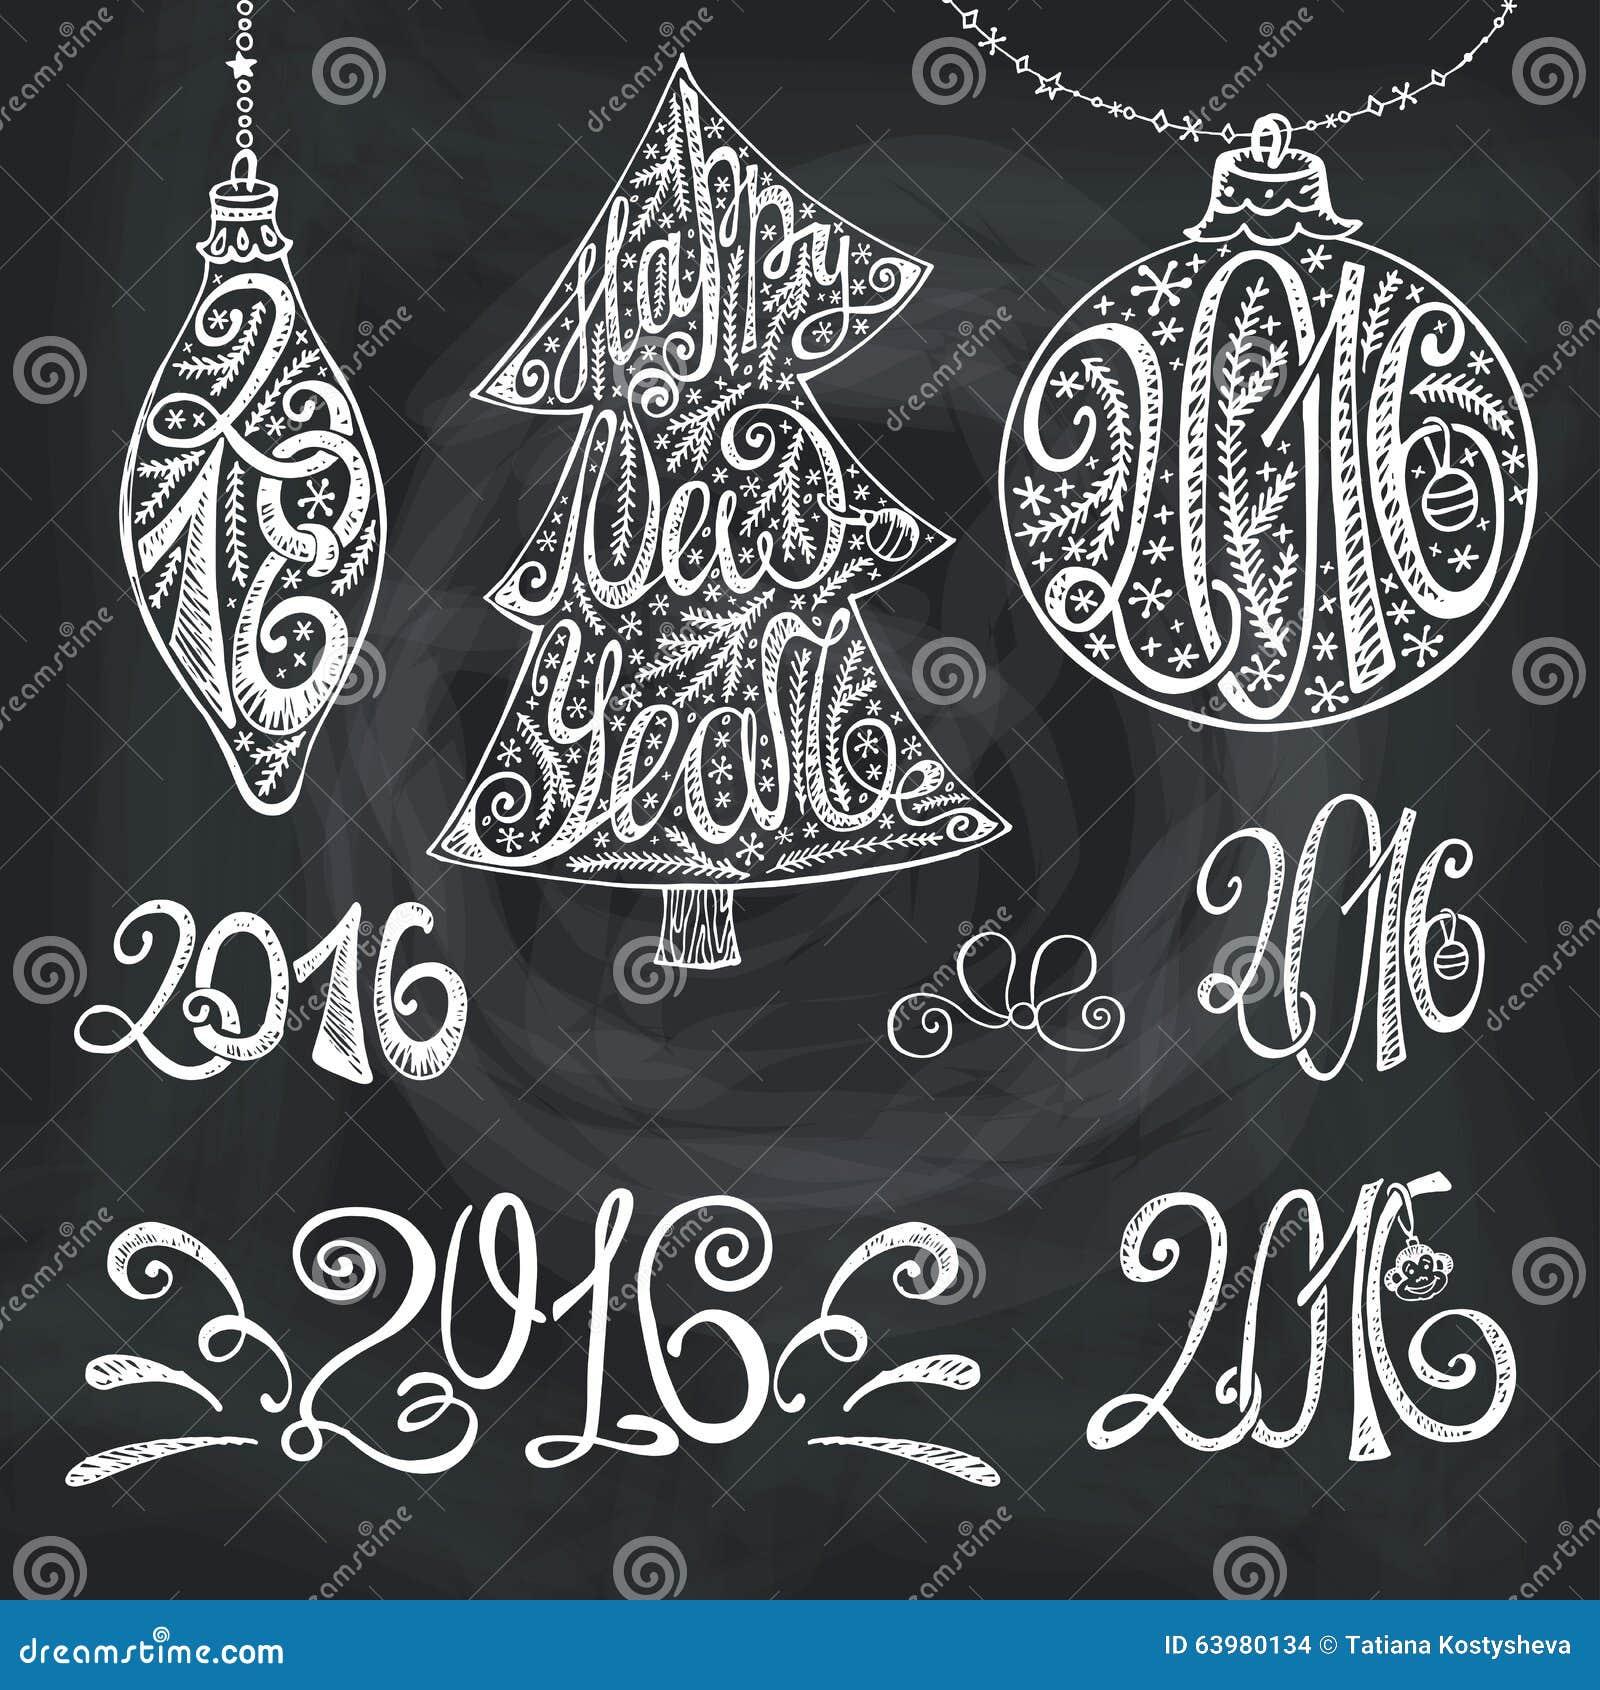 2016 year typography hand drawn titles.Chalk